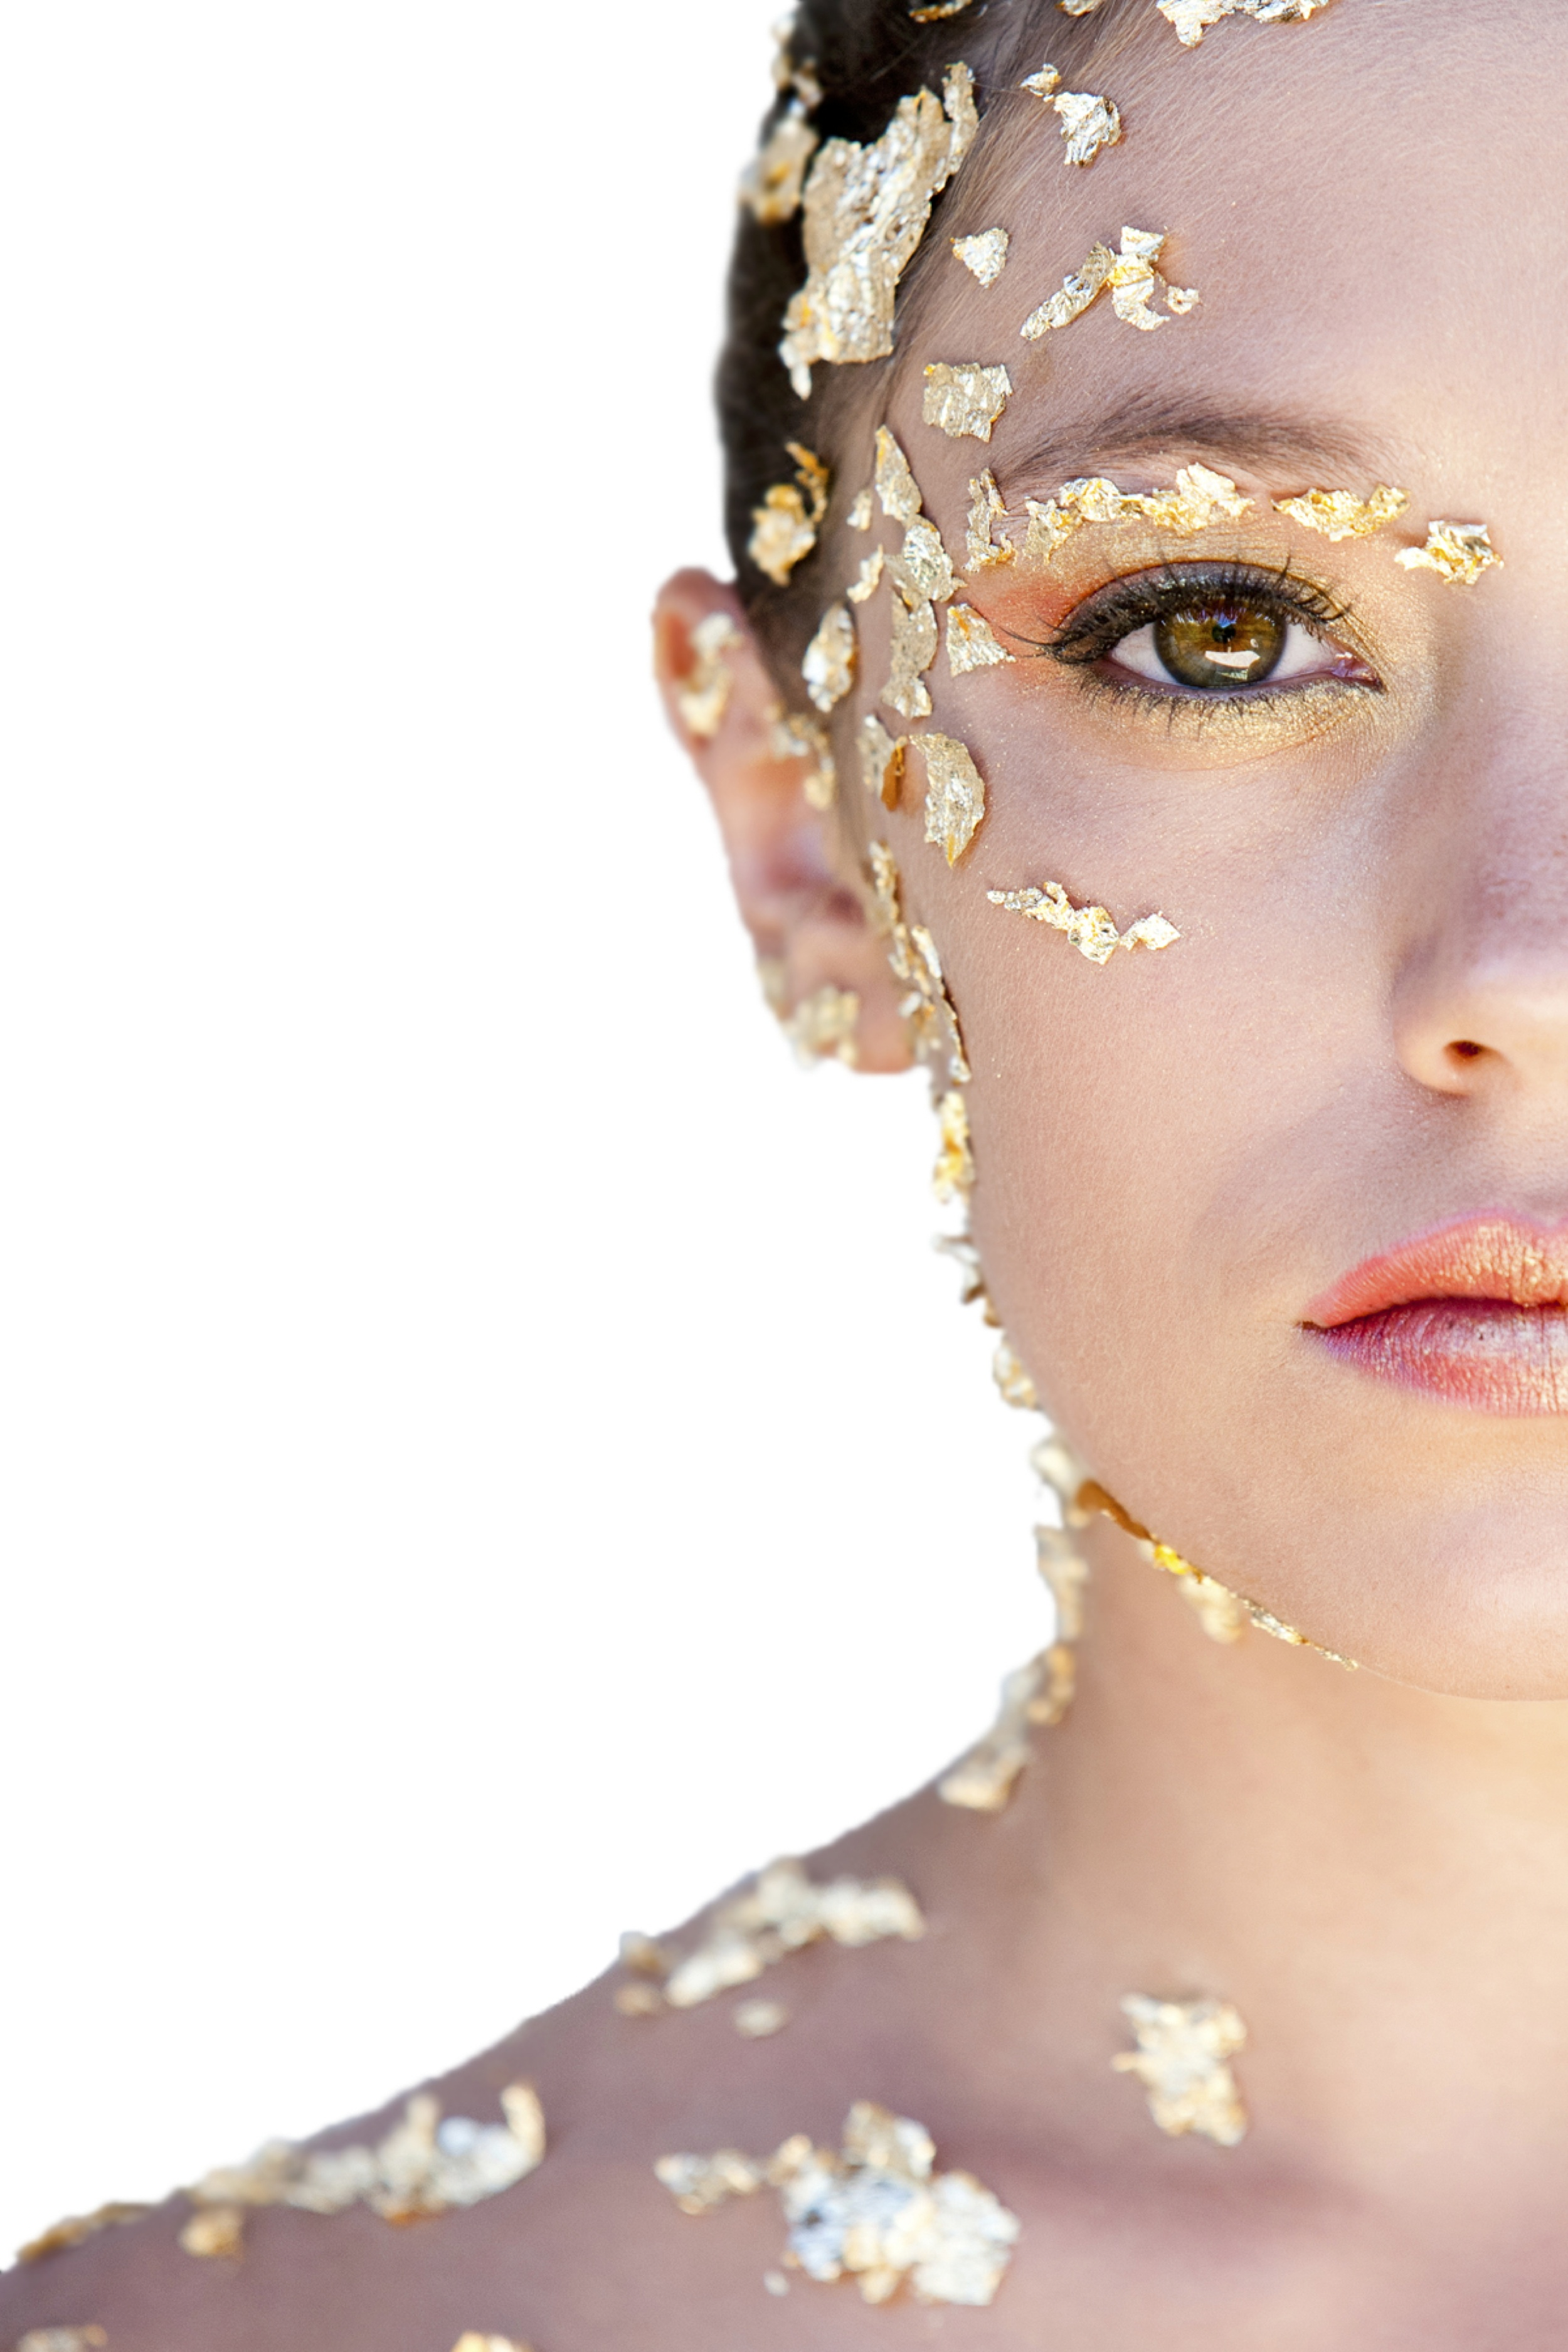 Maquillage artistique feuilles d'or